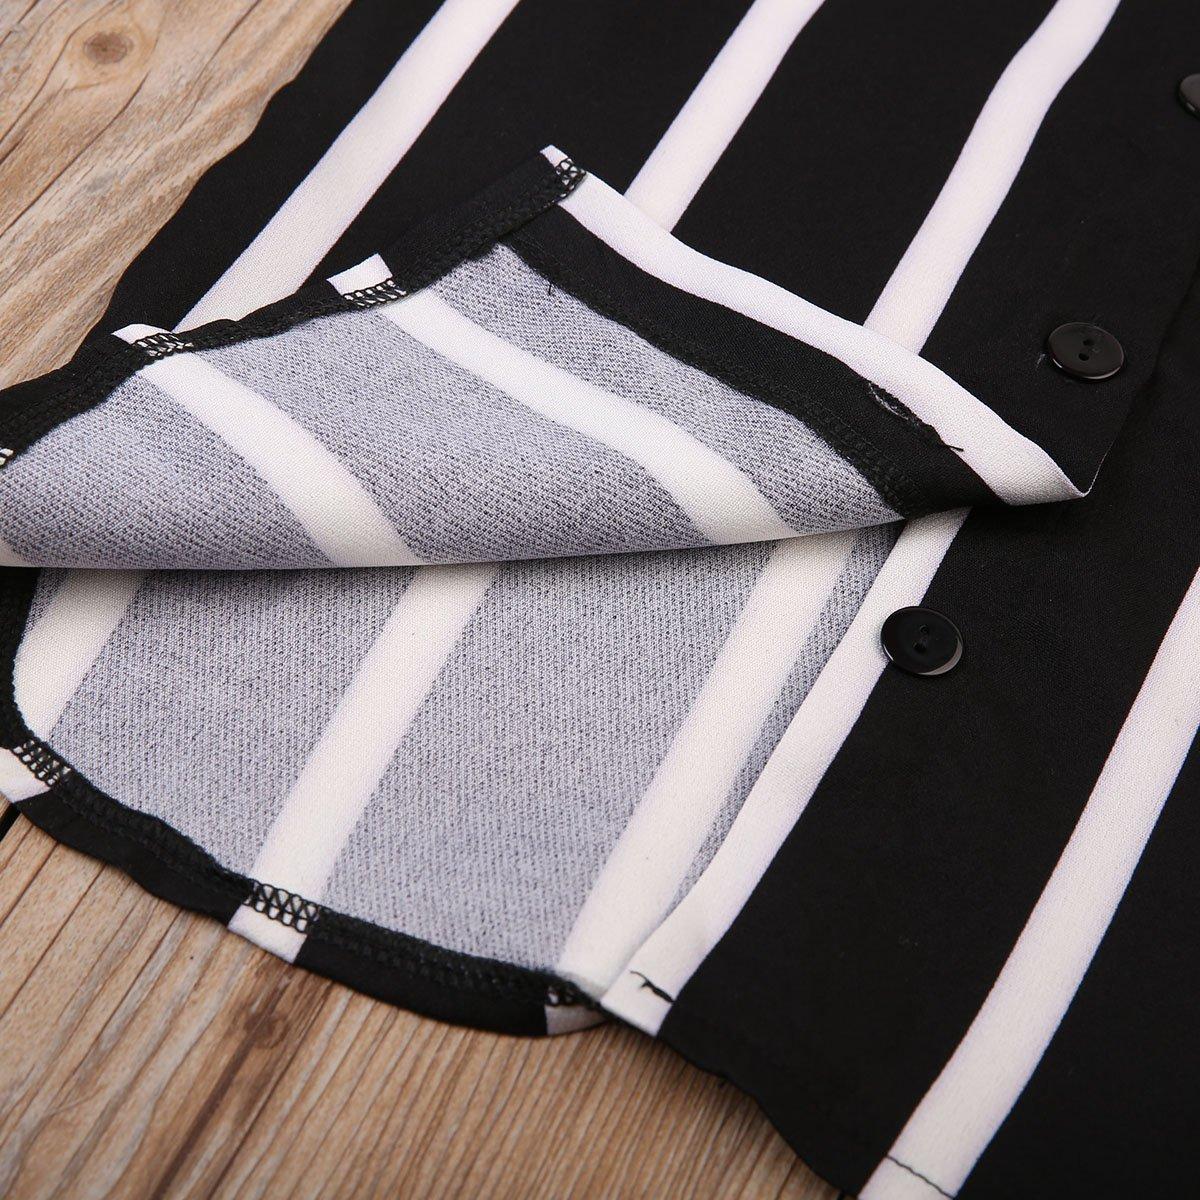 Littler Baby Girl Fashion Black and White Striped Shirt